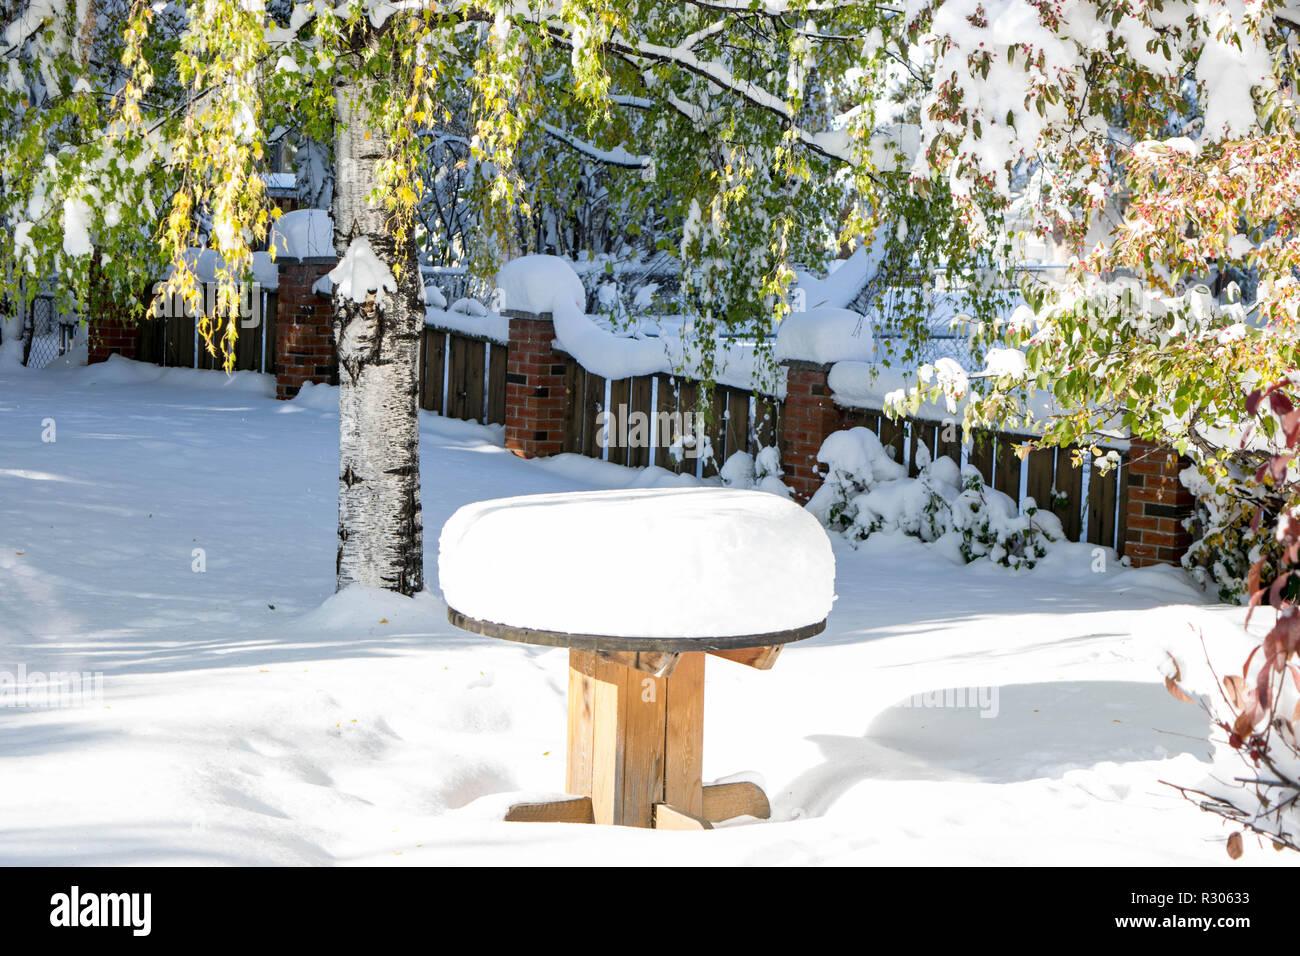 Snowfall fresh on the ground in Calgary - Stock Image